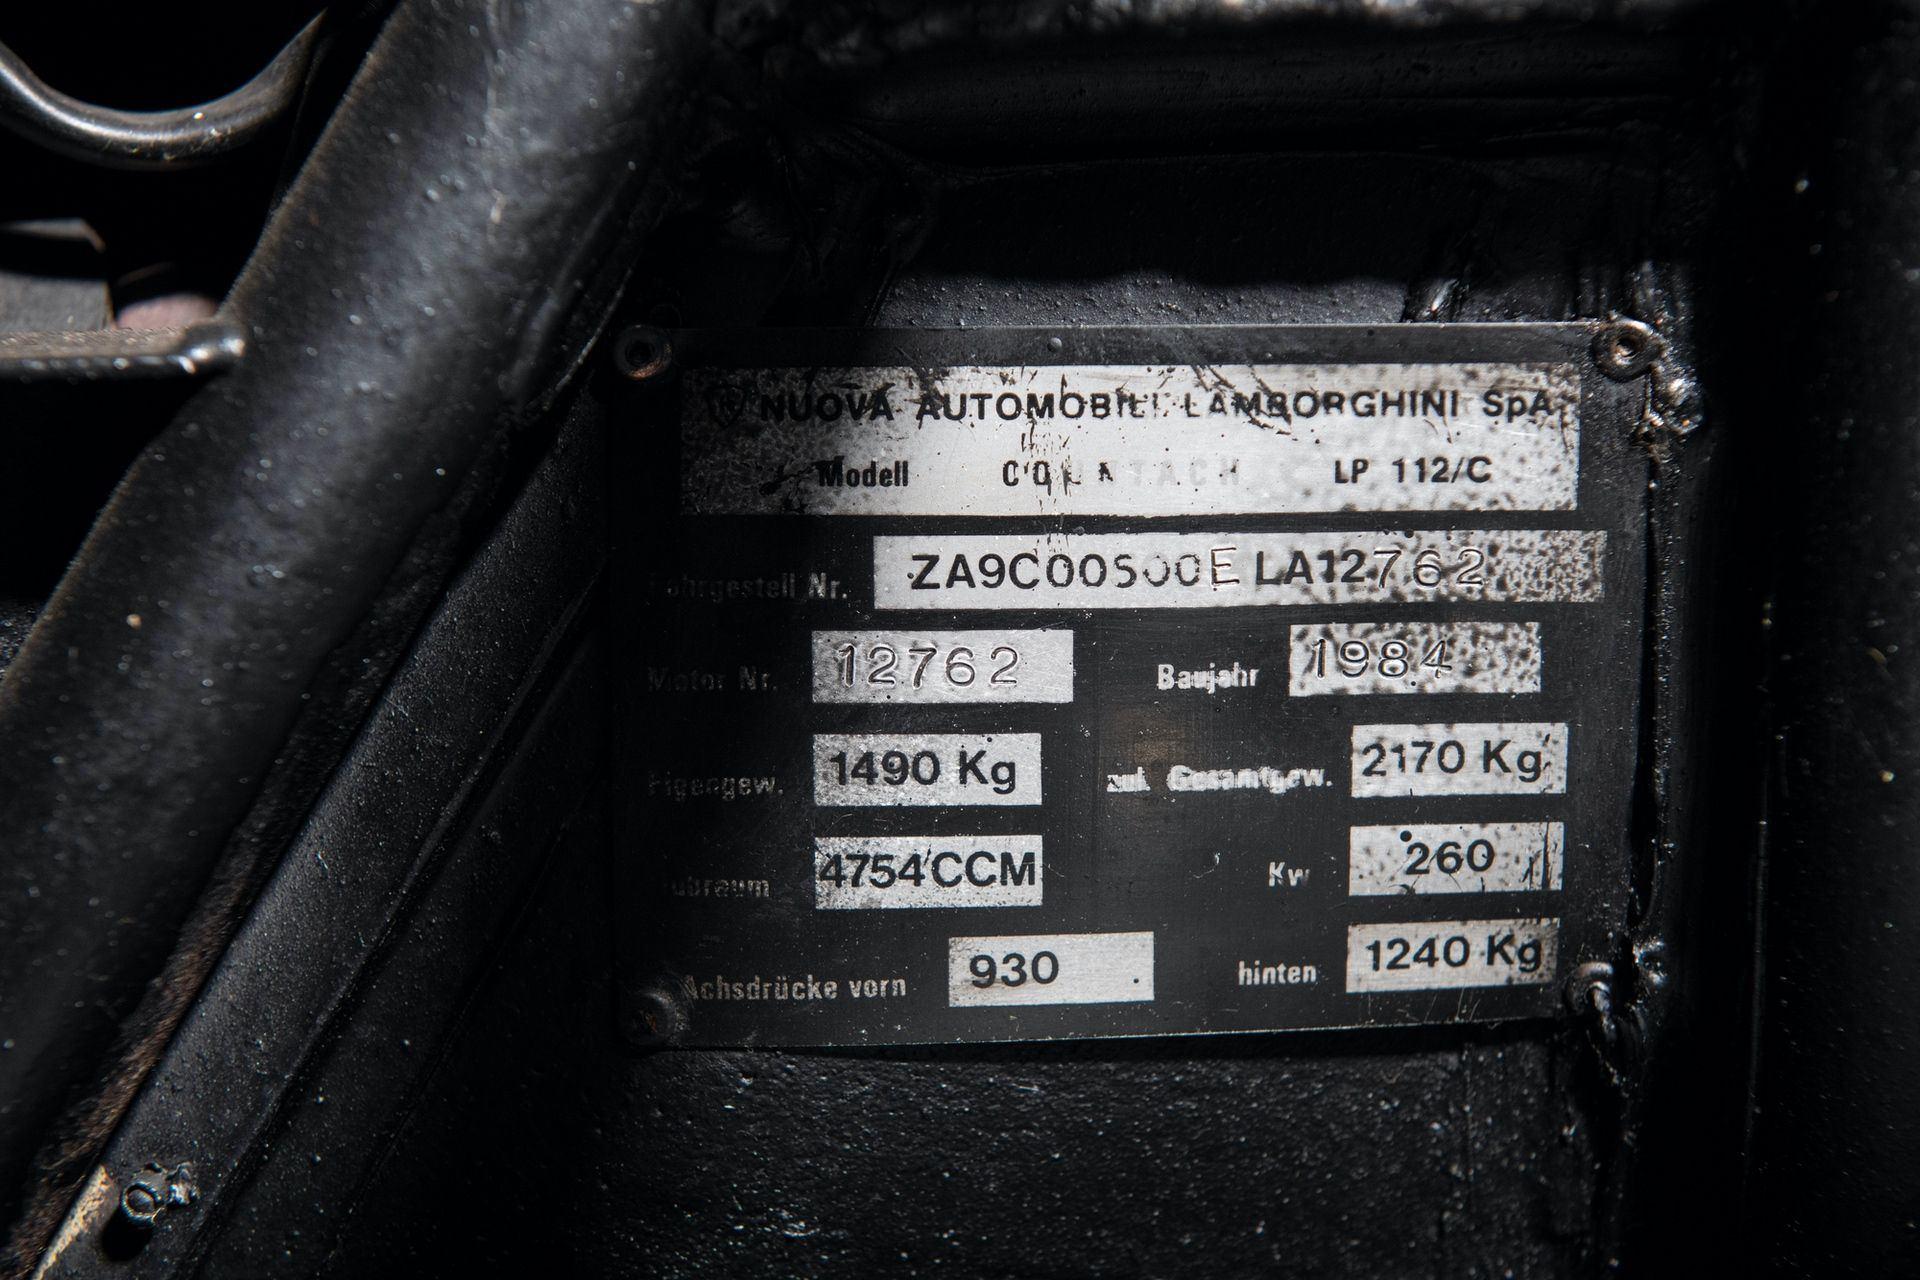 Lamborghini_Countach_5000S_0030